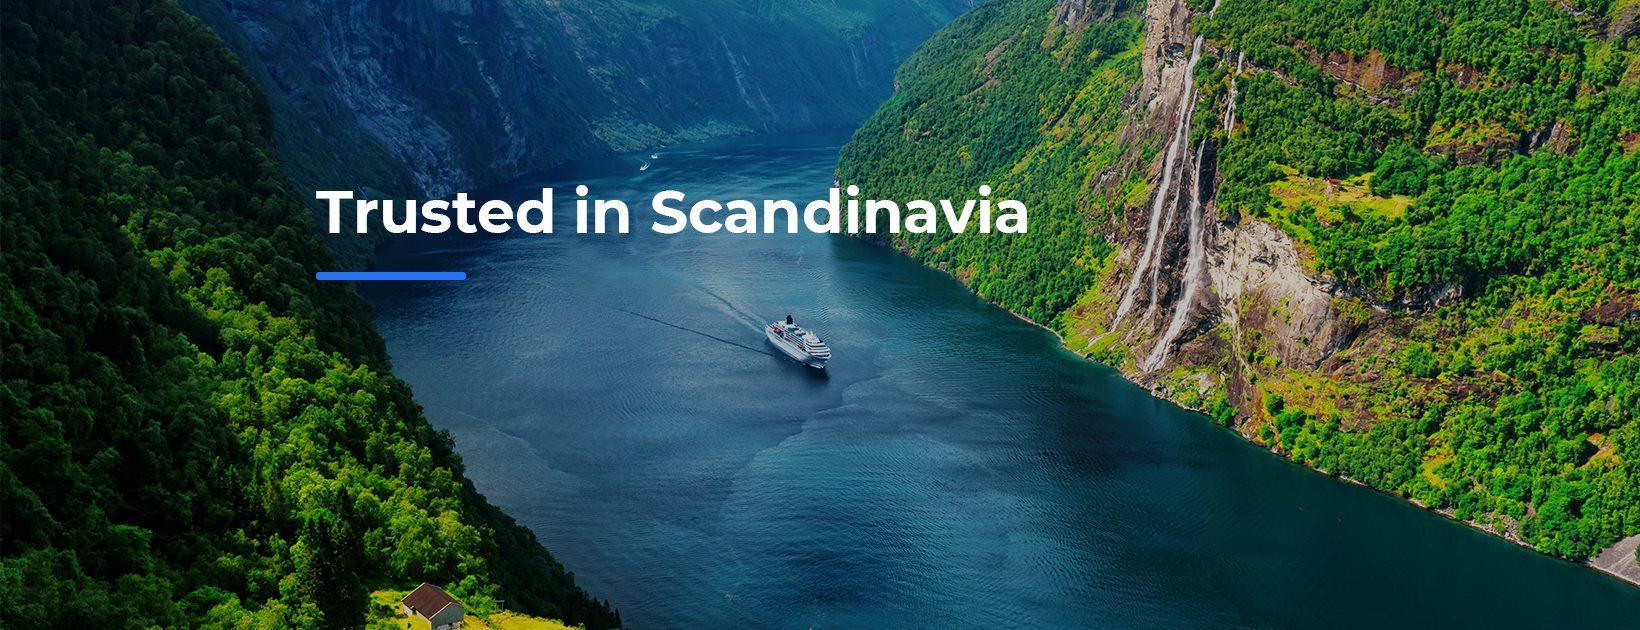 Nordcrewing - Trusted in Scandinavia